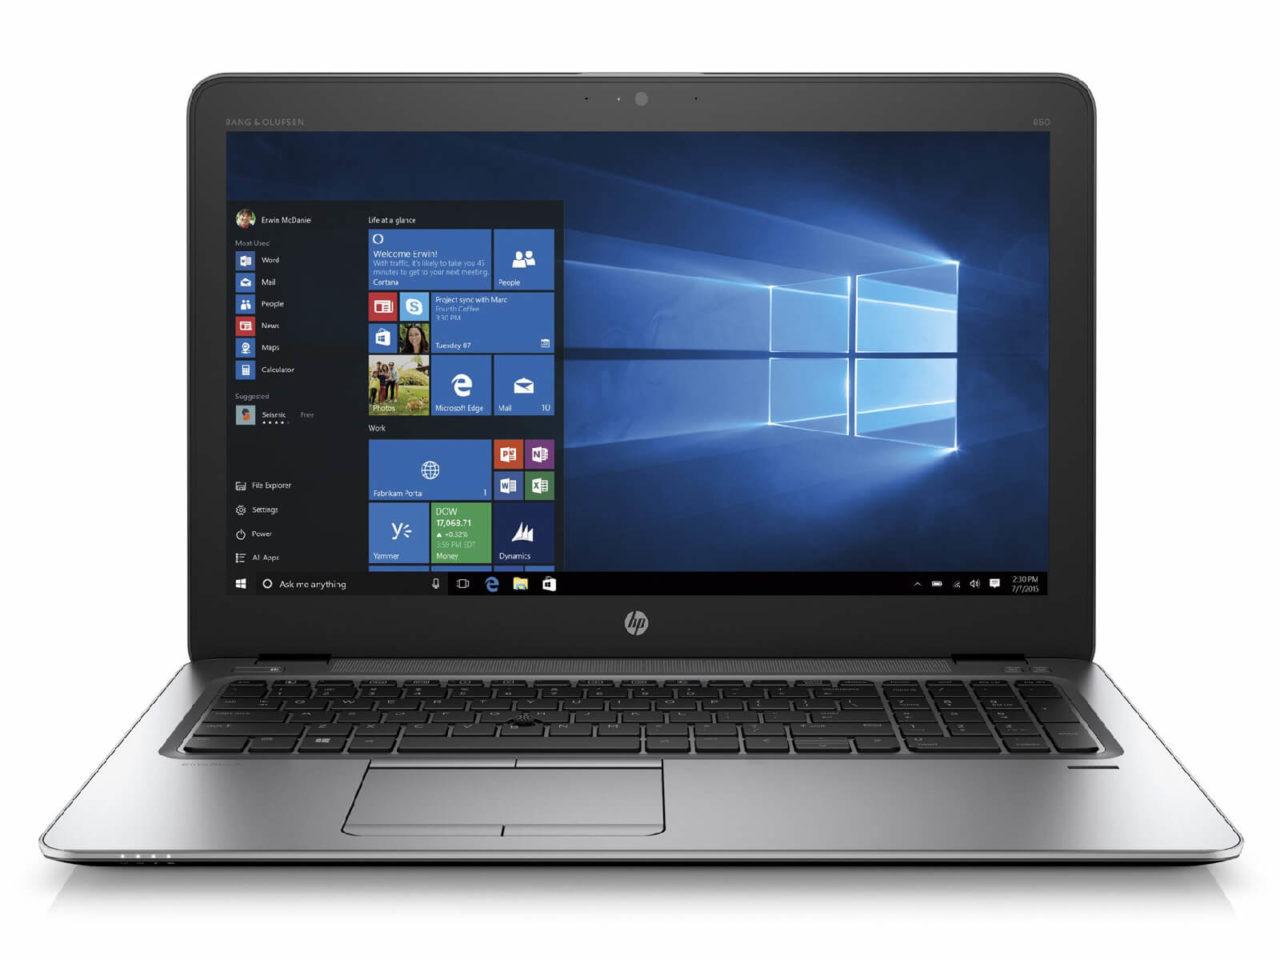 Buy Refurbished HP Elitebook 850 from 3CNZ